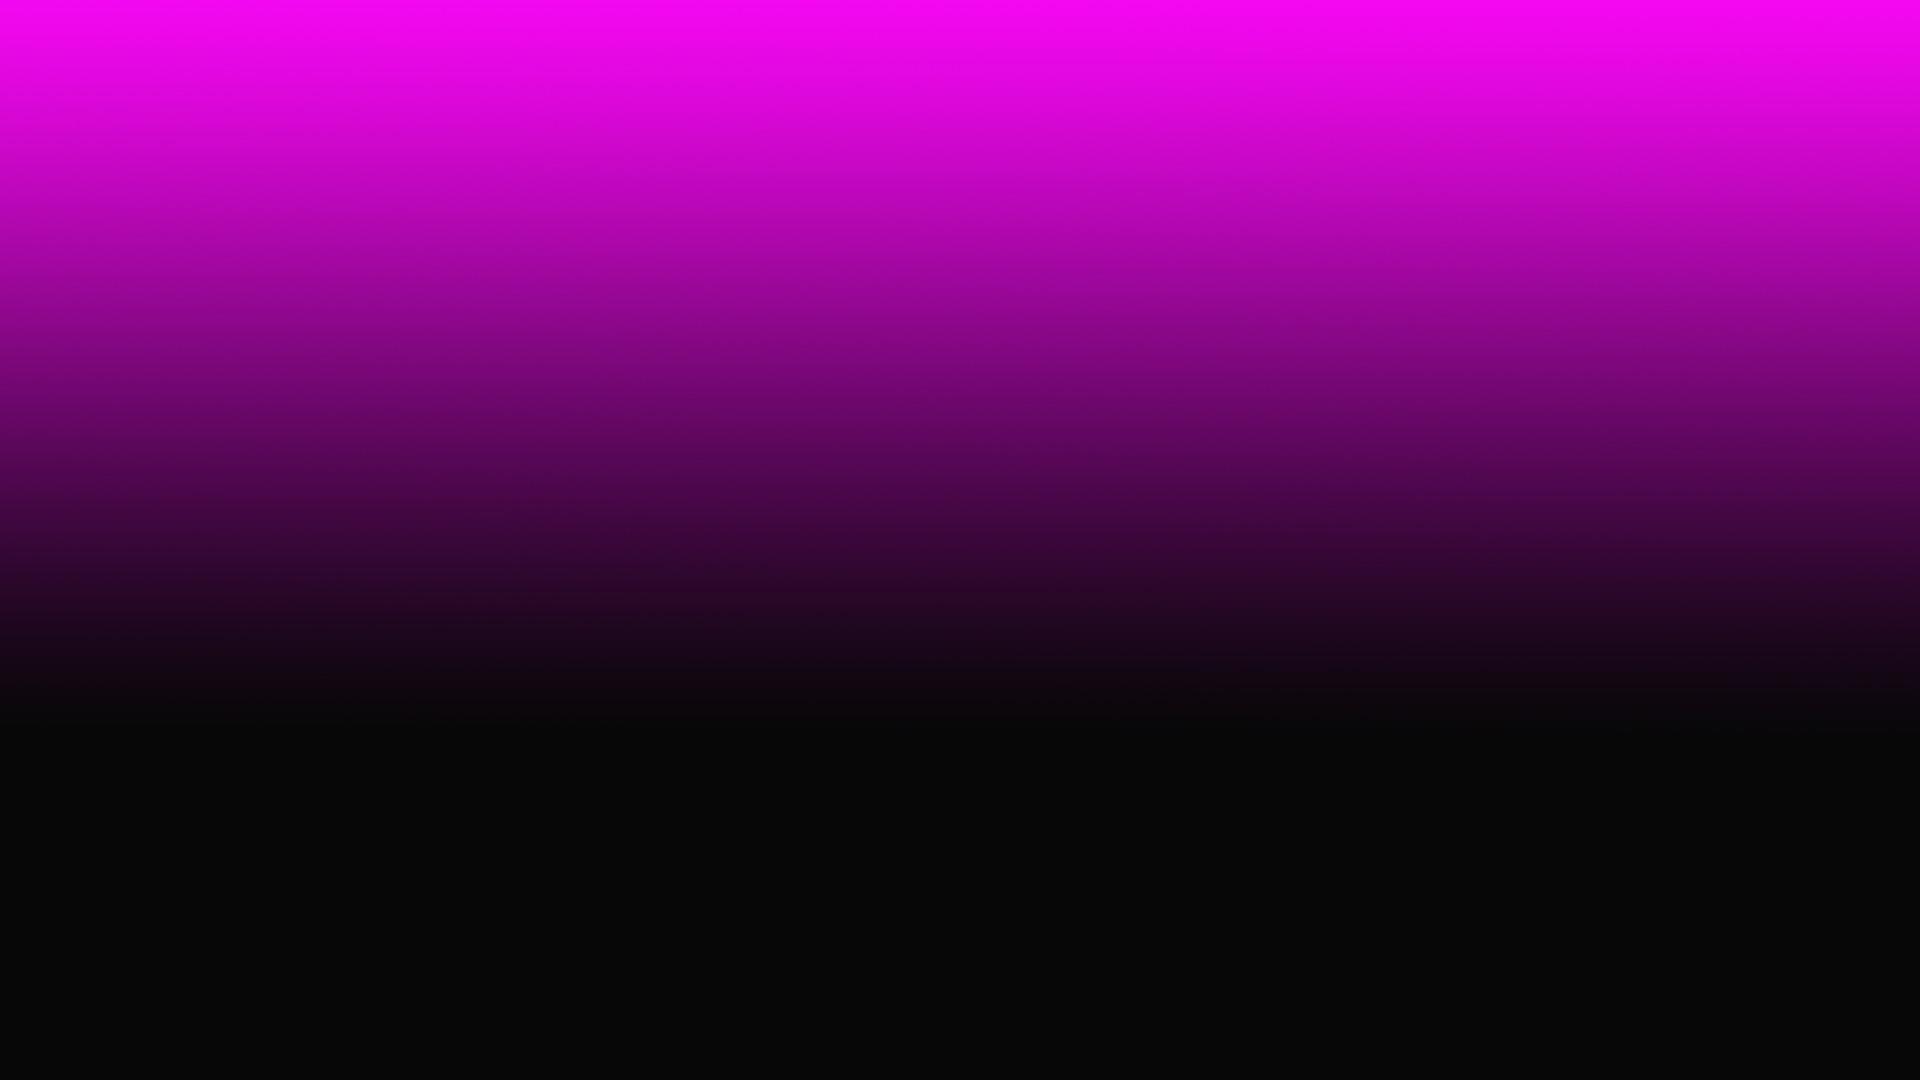 pink purple ombre wallpaper – photo #1. Wall Borders Wallpaper Warehouse